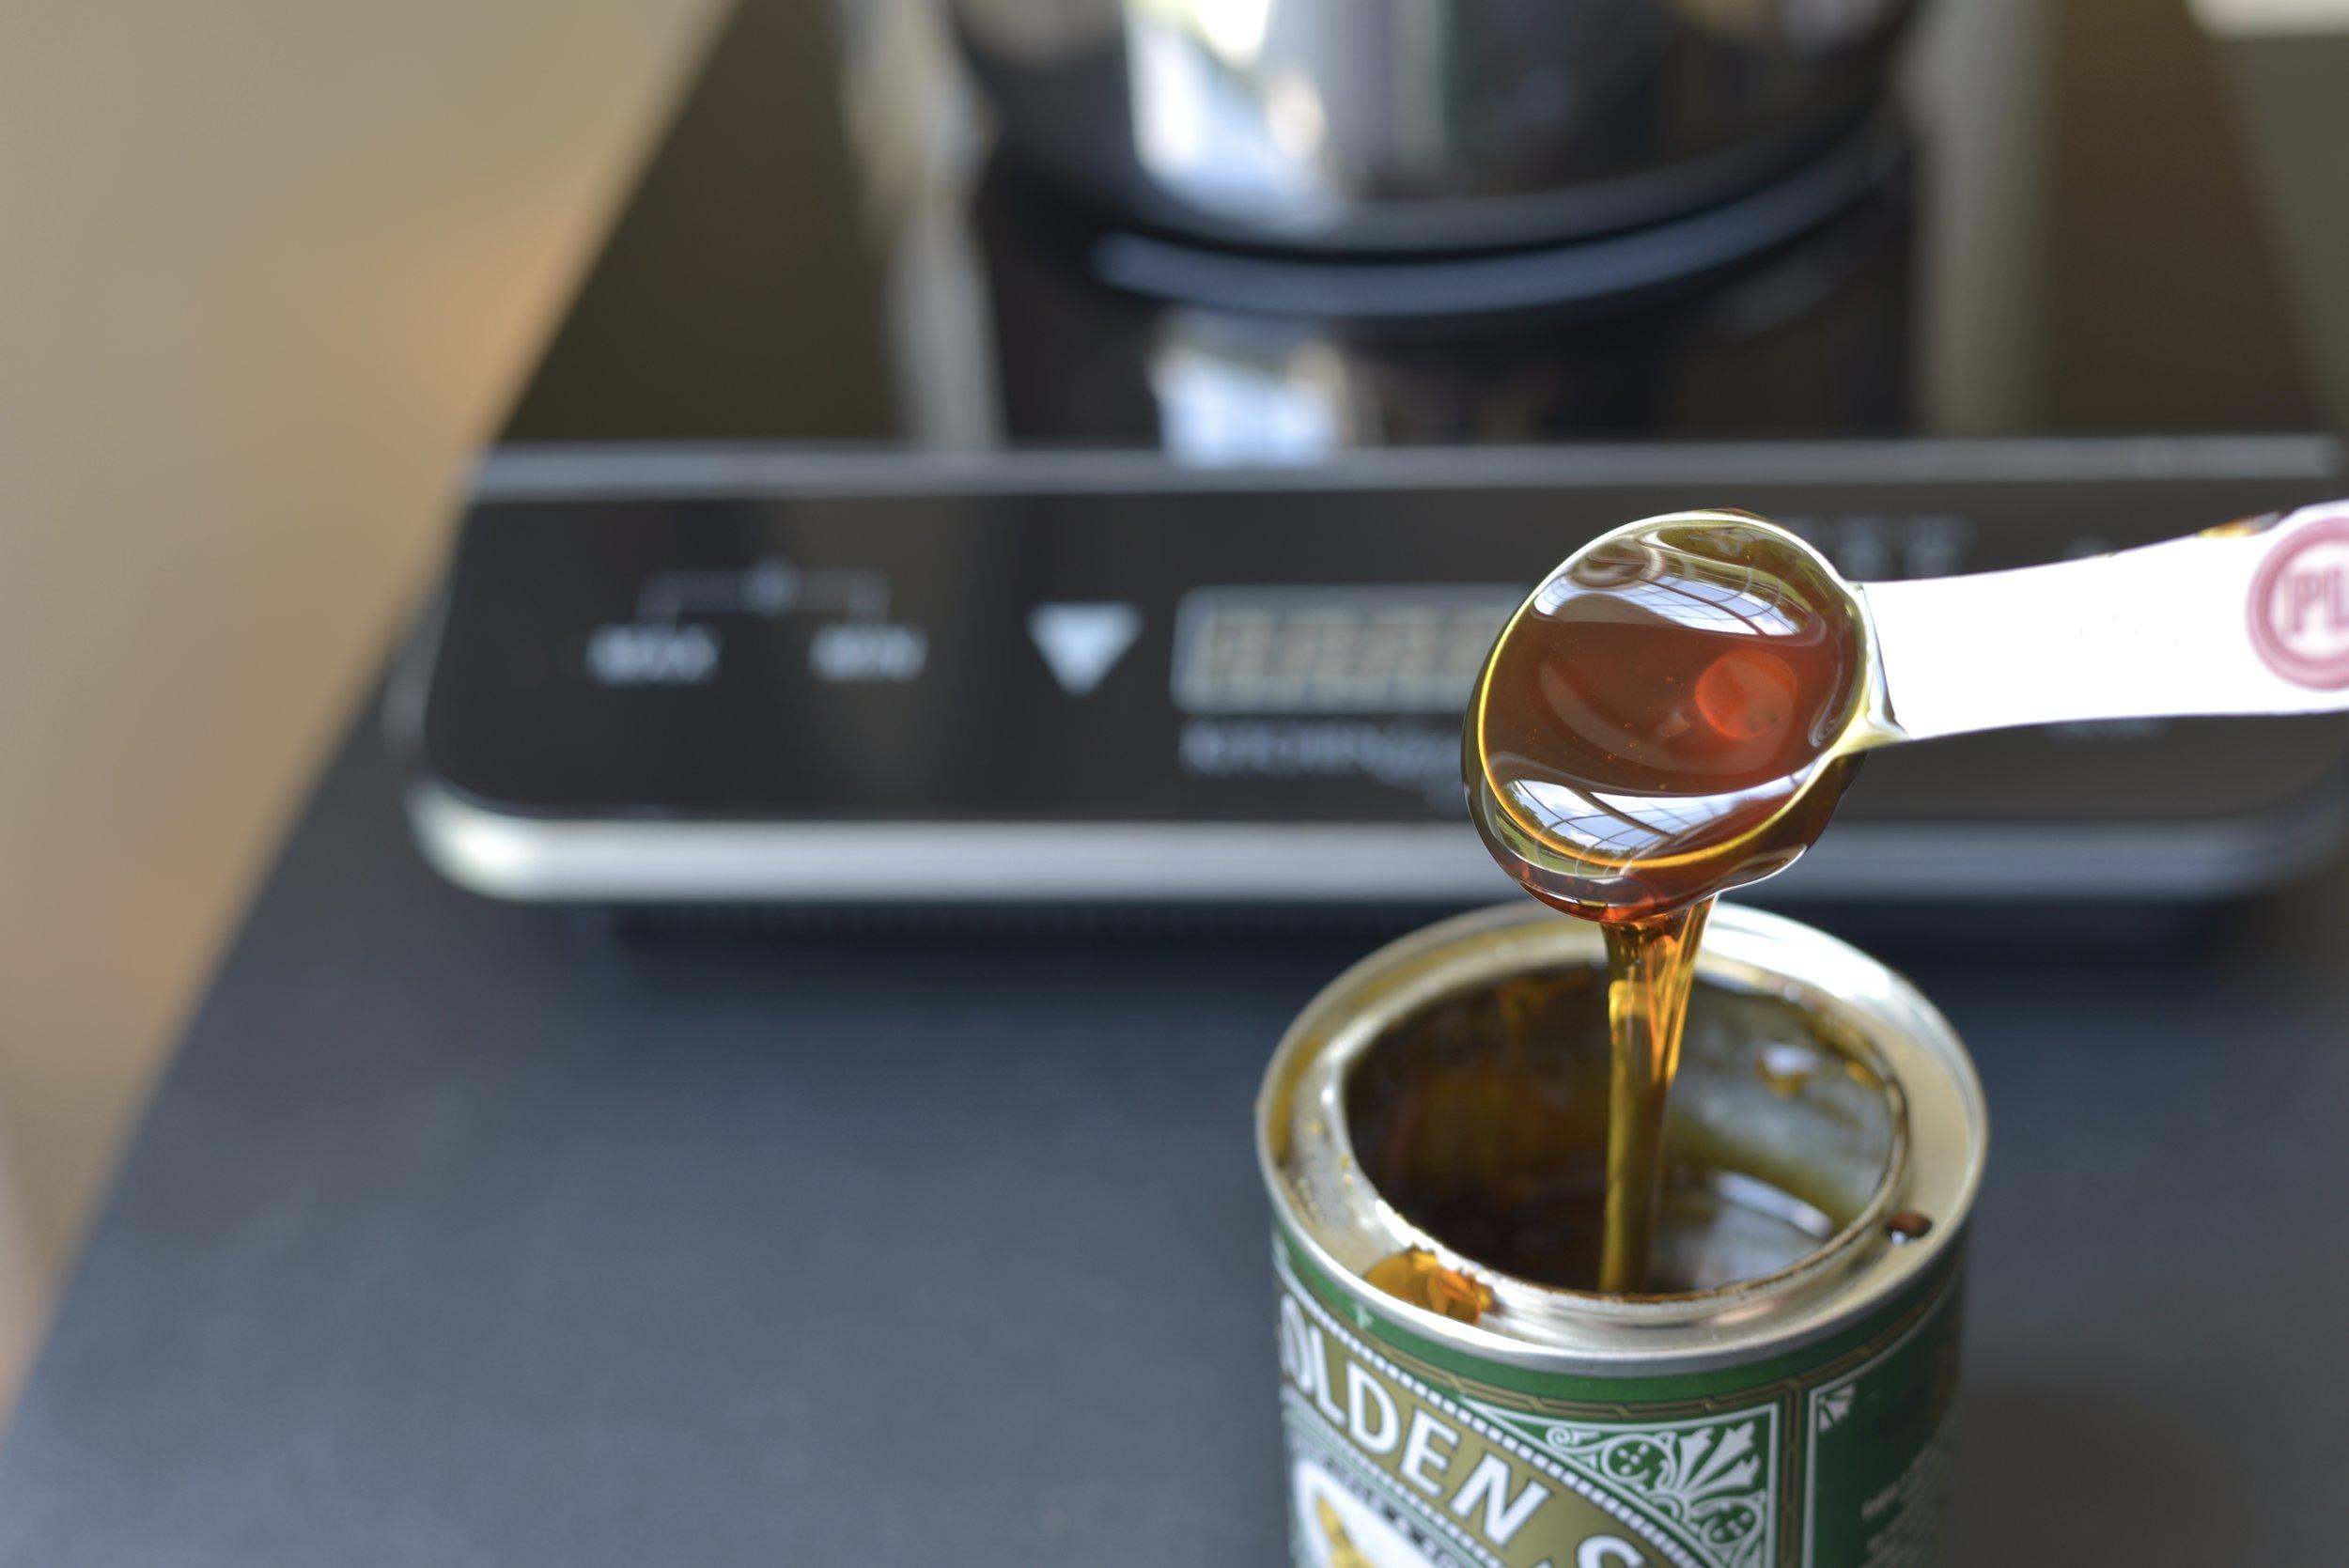 lyles-golden-syrup-butteryum